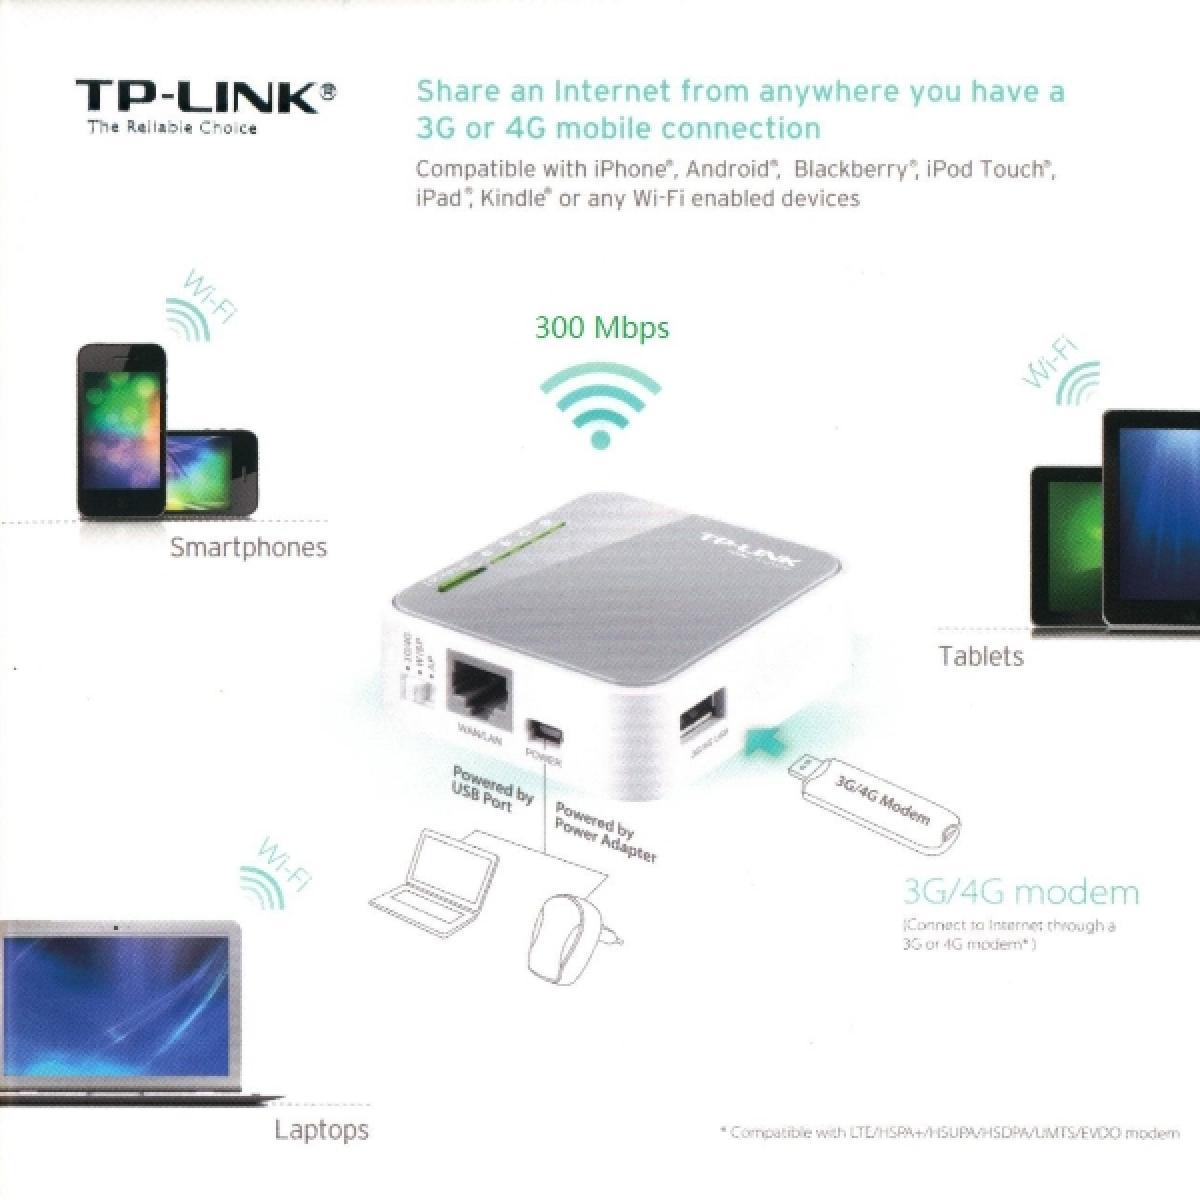 TP-LINK Portable 3G/4G Wireless N Router | GTS - Amman Jordan | GTS